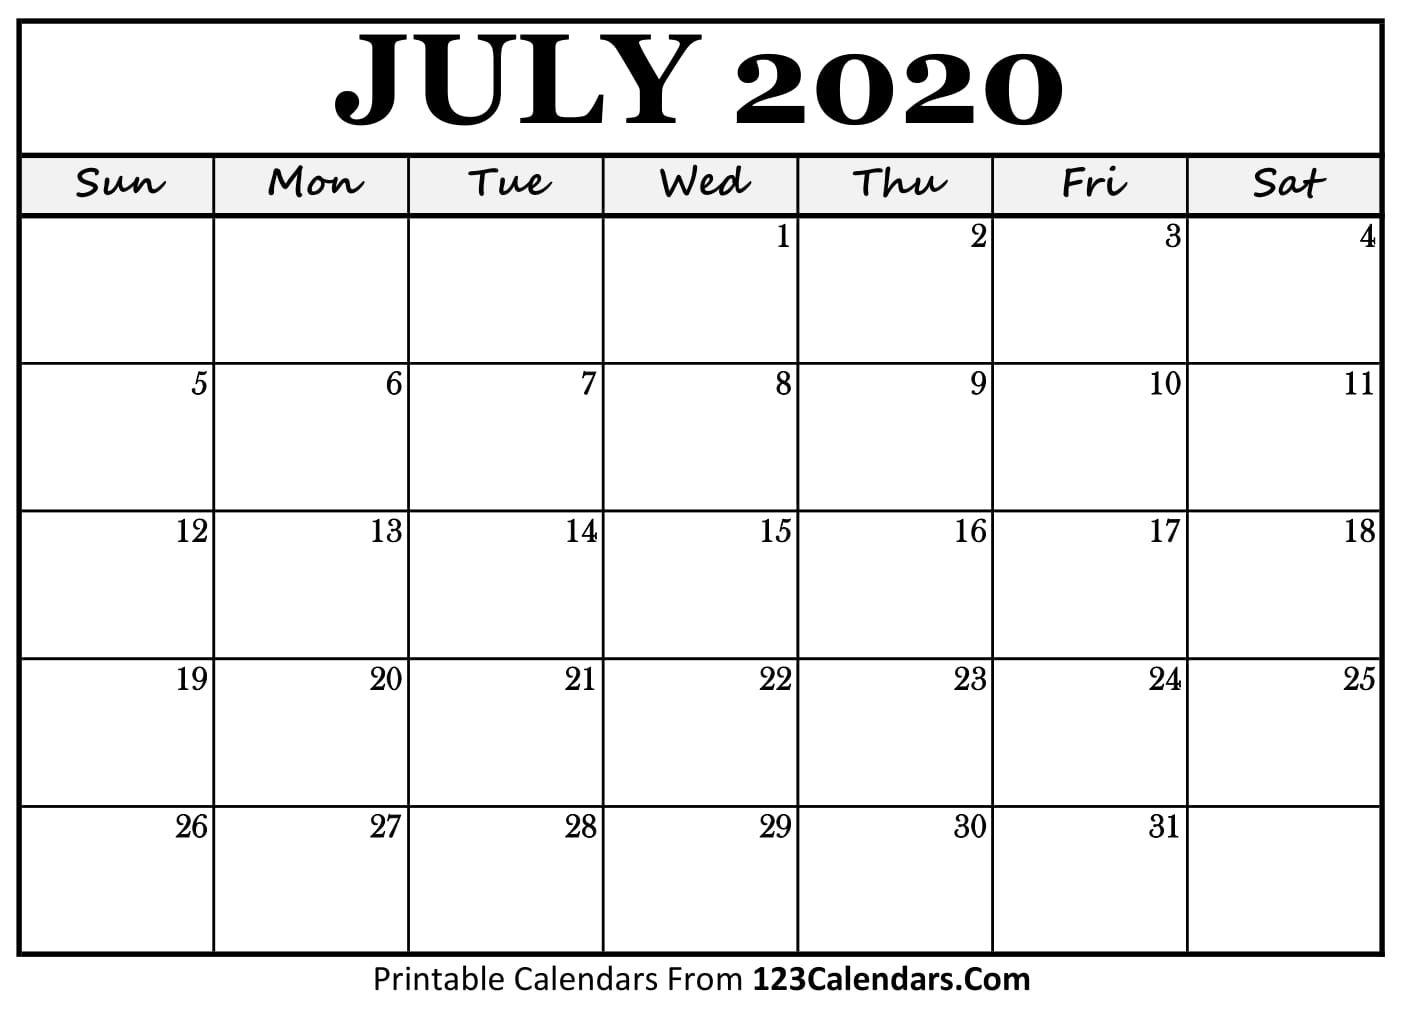 July 2020 Printable Calendar | 123Calendars